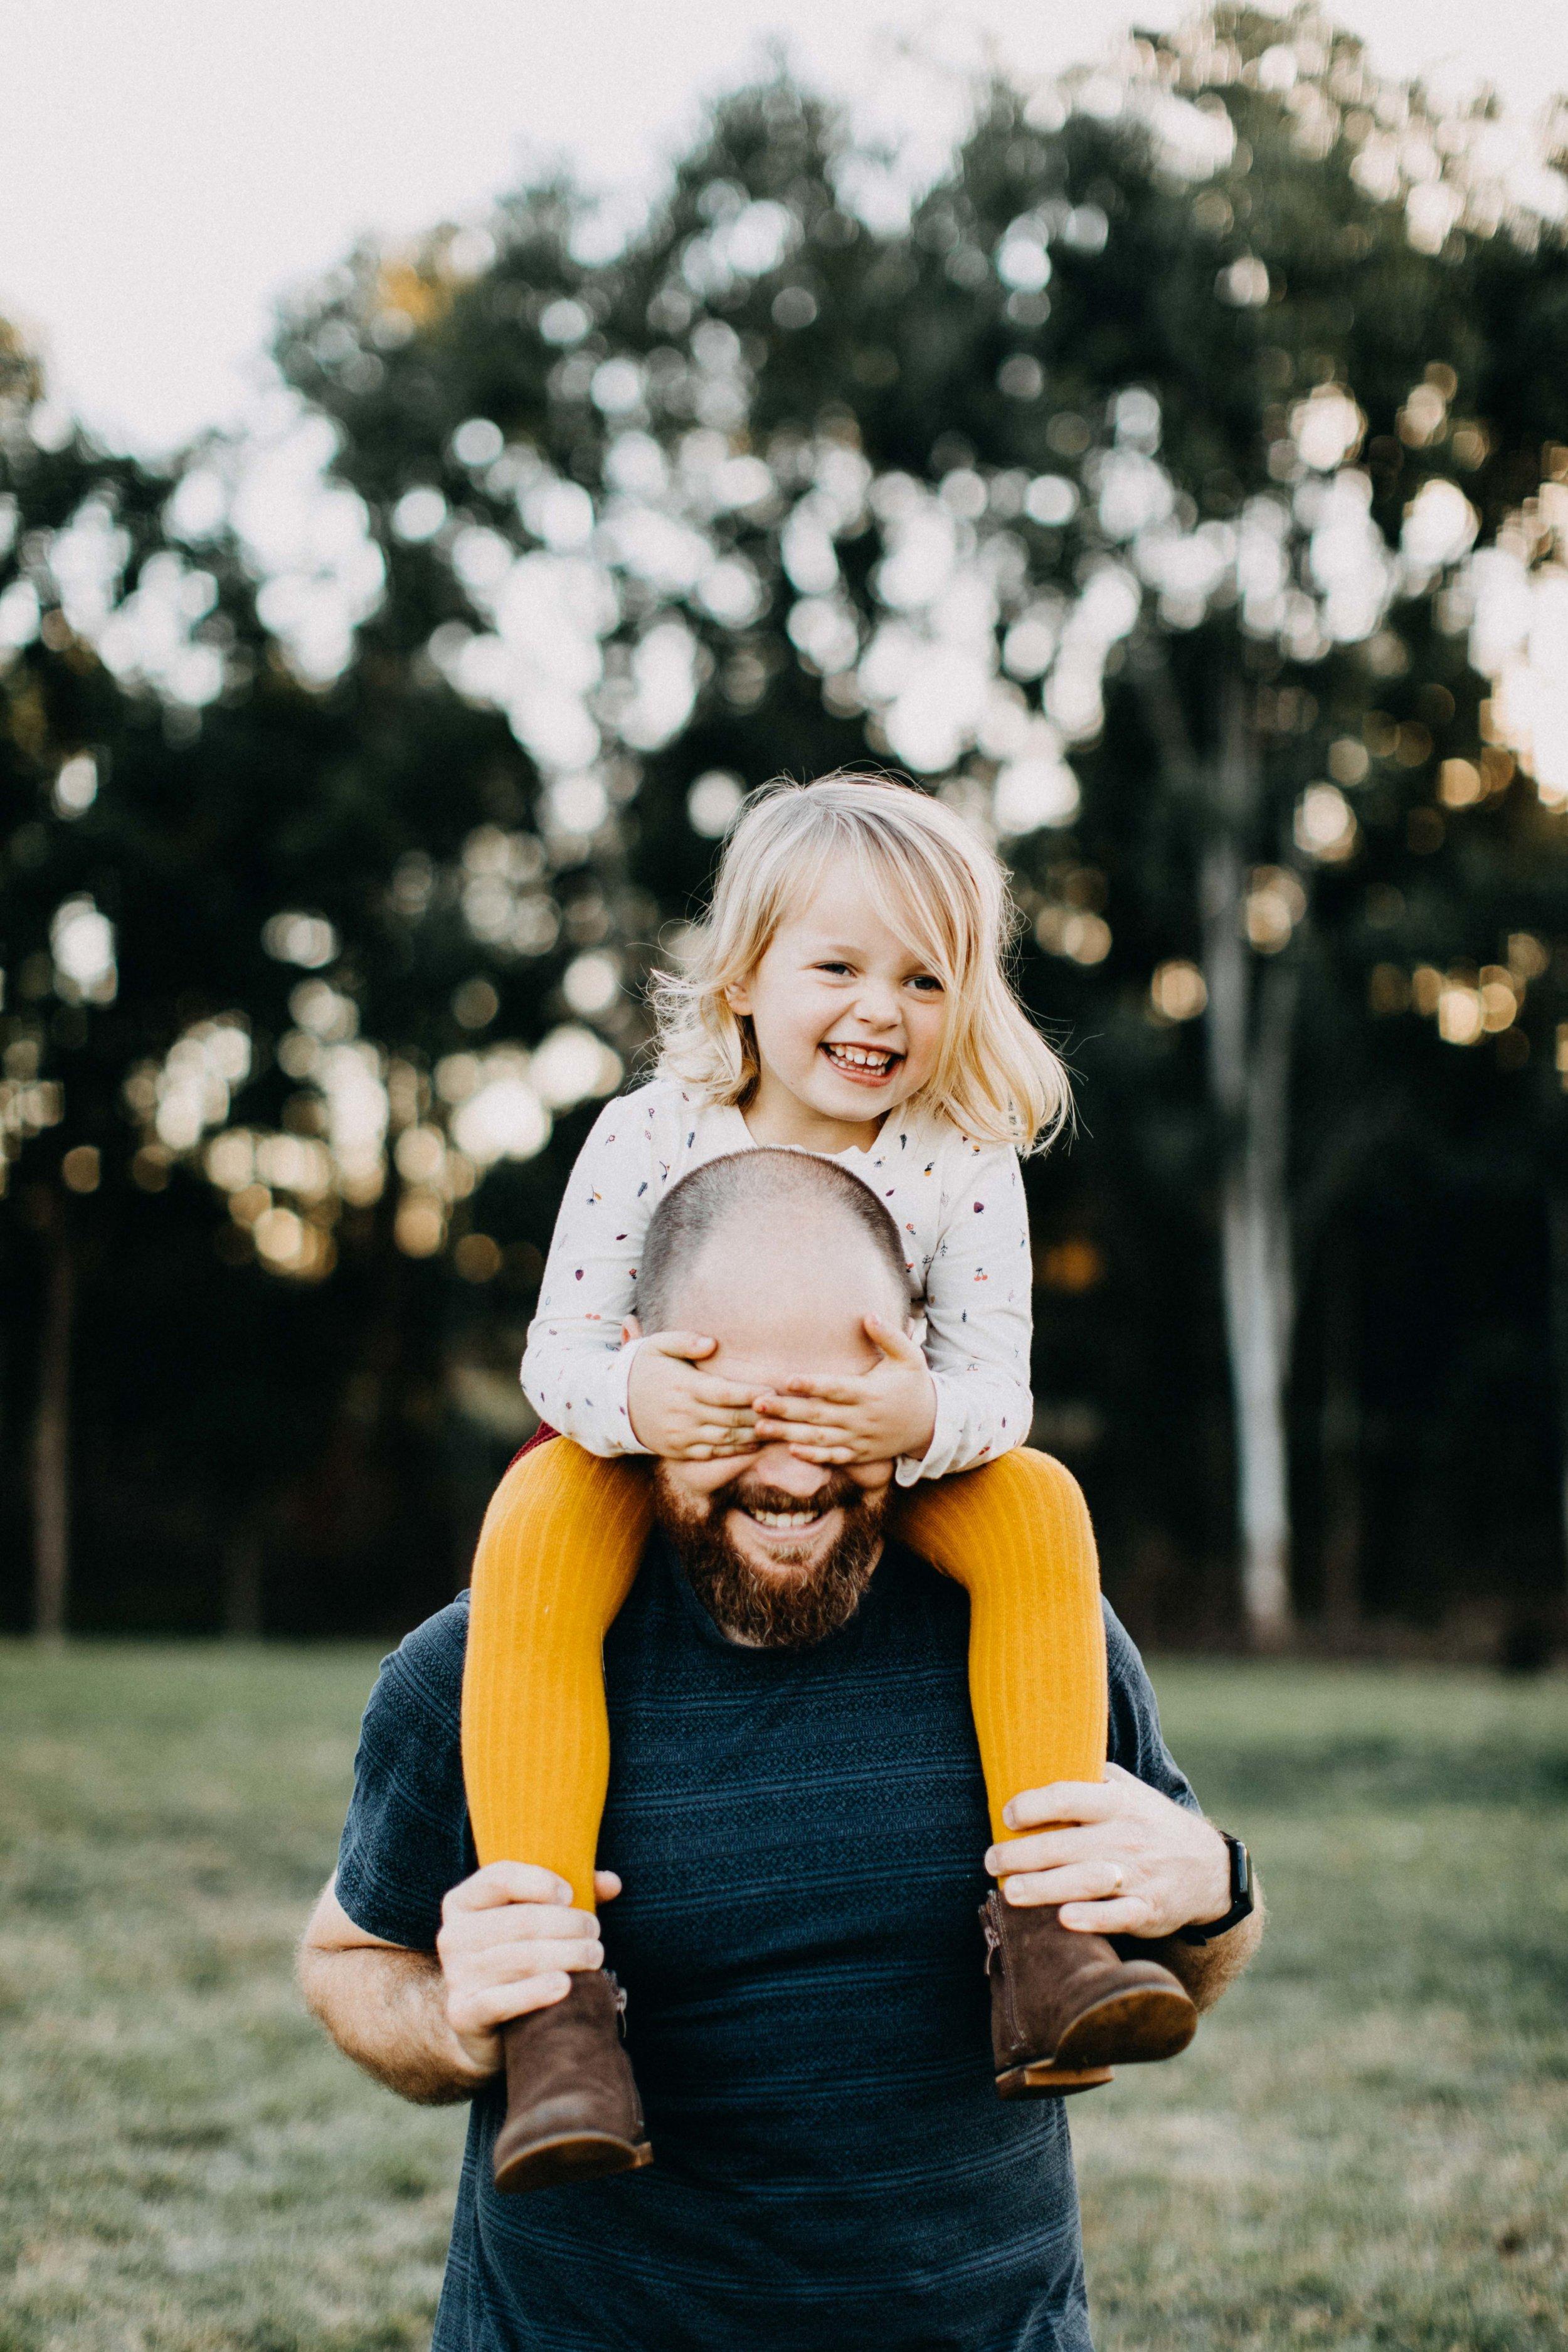 camden-family-photography-boot-family-session-39.jpg